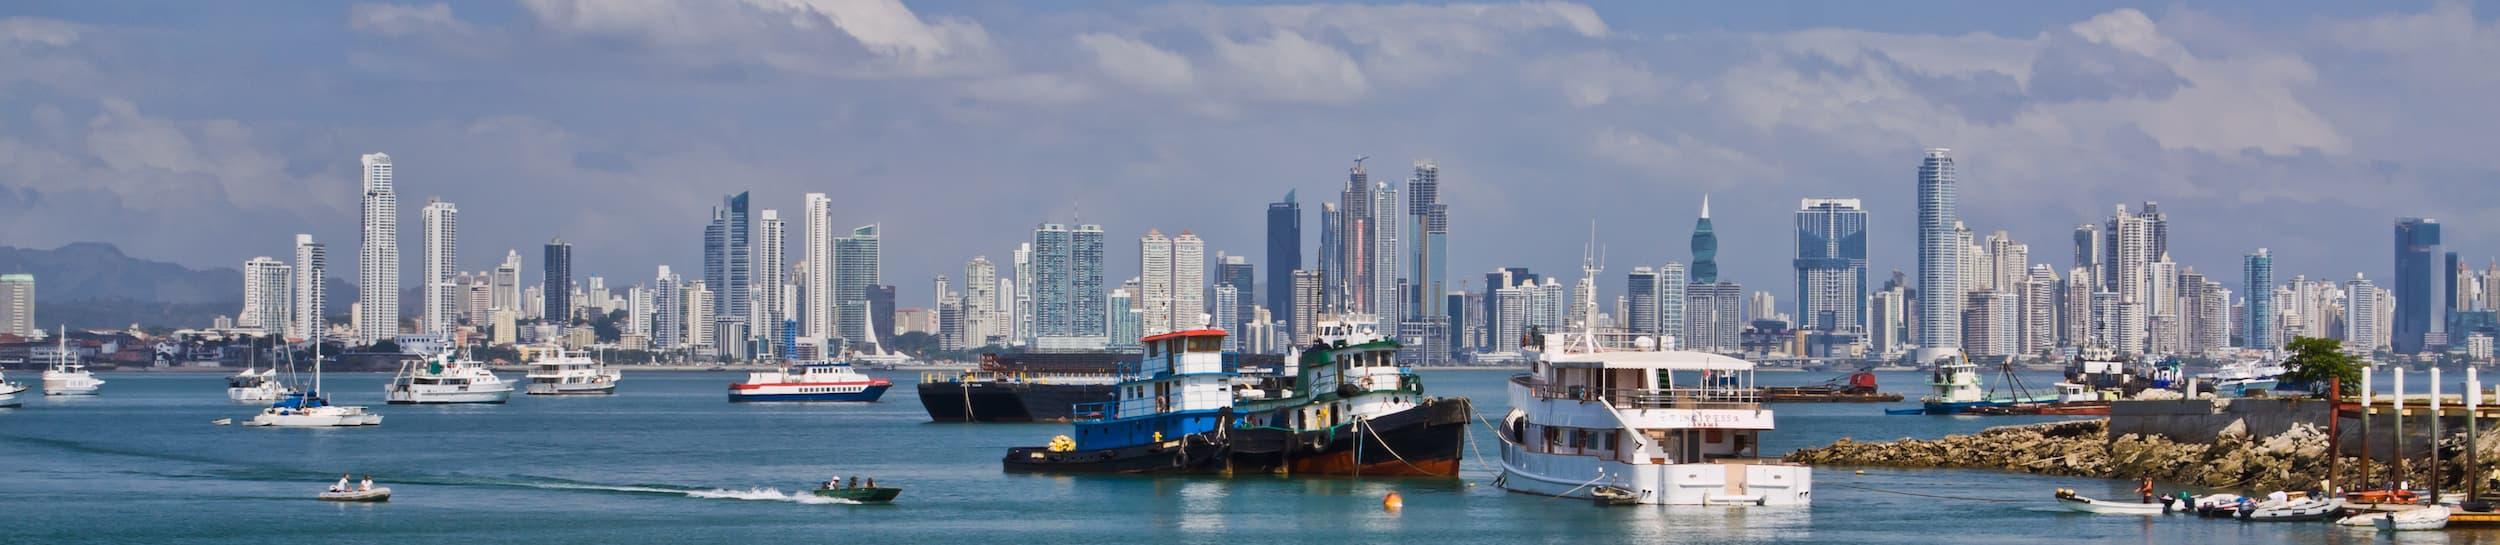 Jobs and salaries in Panama, Panama - Teleport Cities